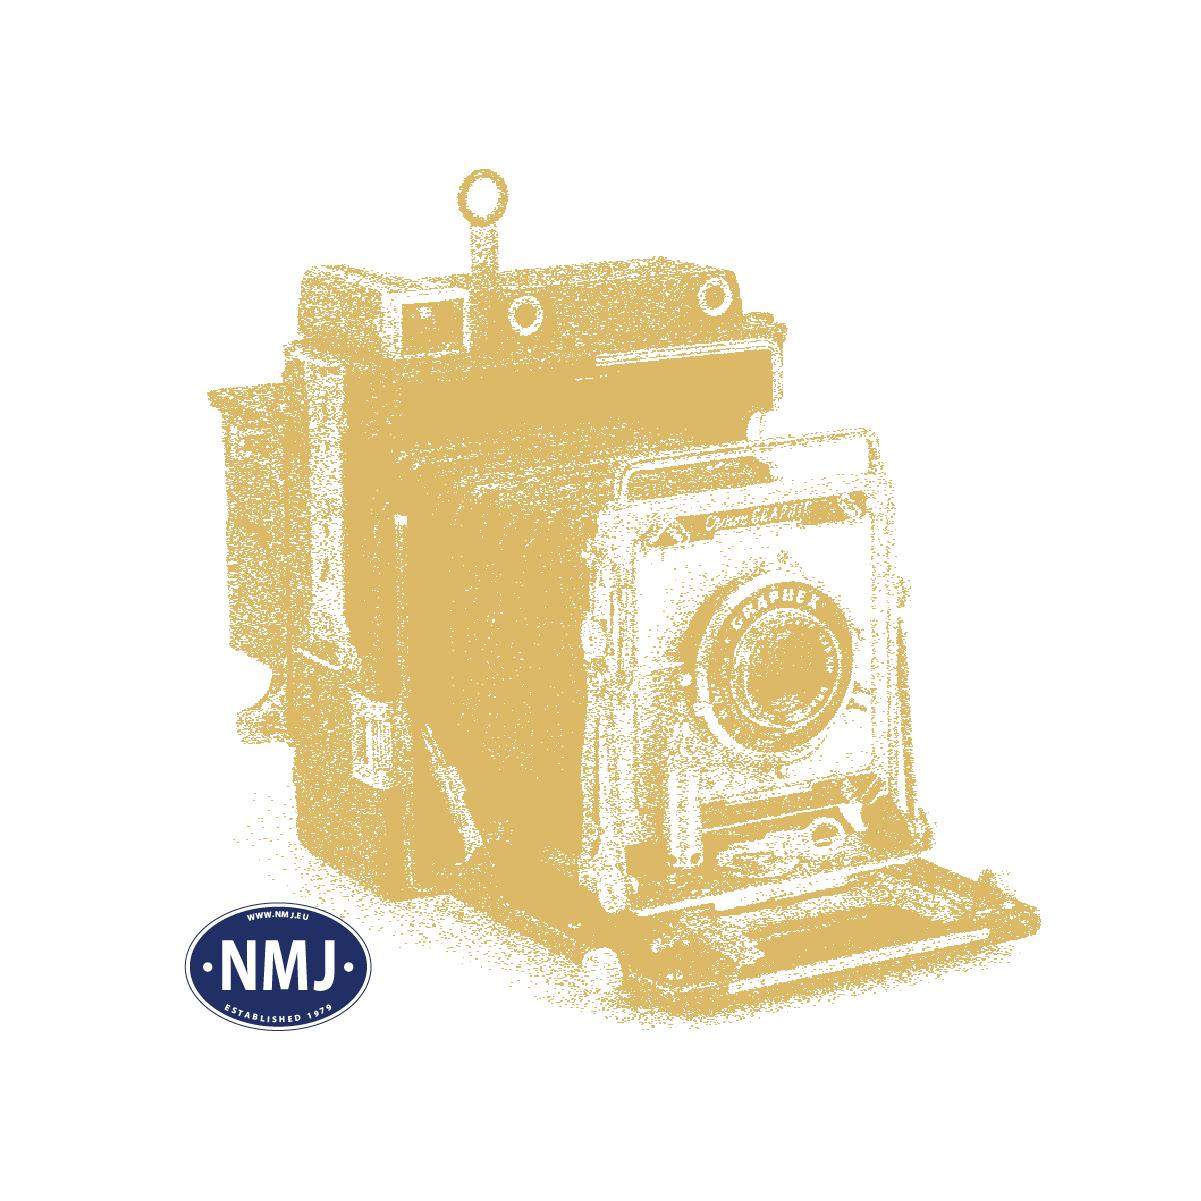 "NMJT87.202 - NMJ Topline NSB El 11b.2145 ""Gullkalven"", DC"